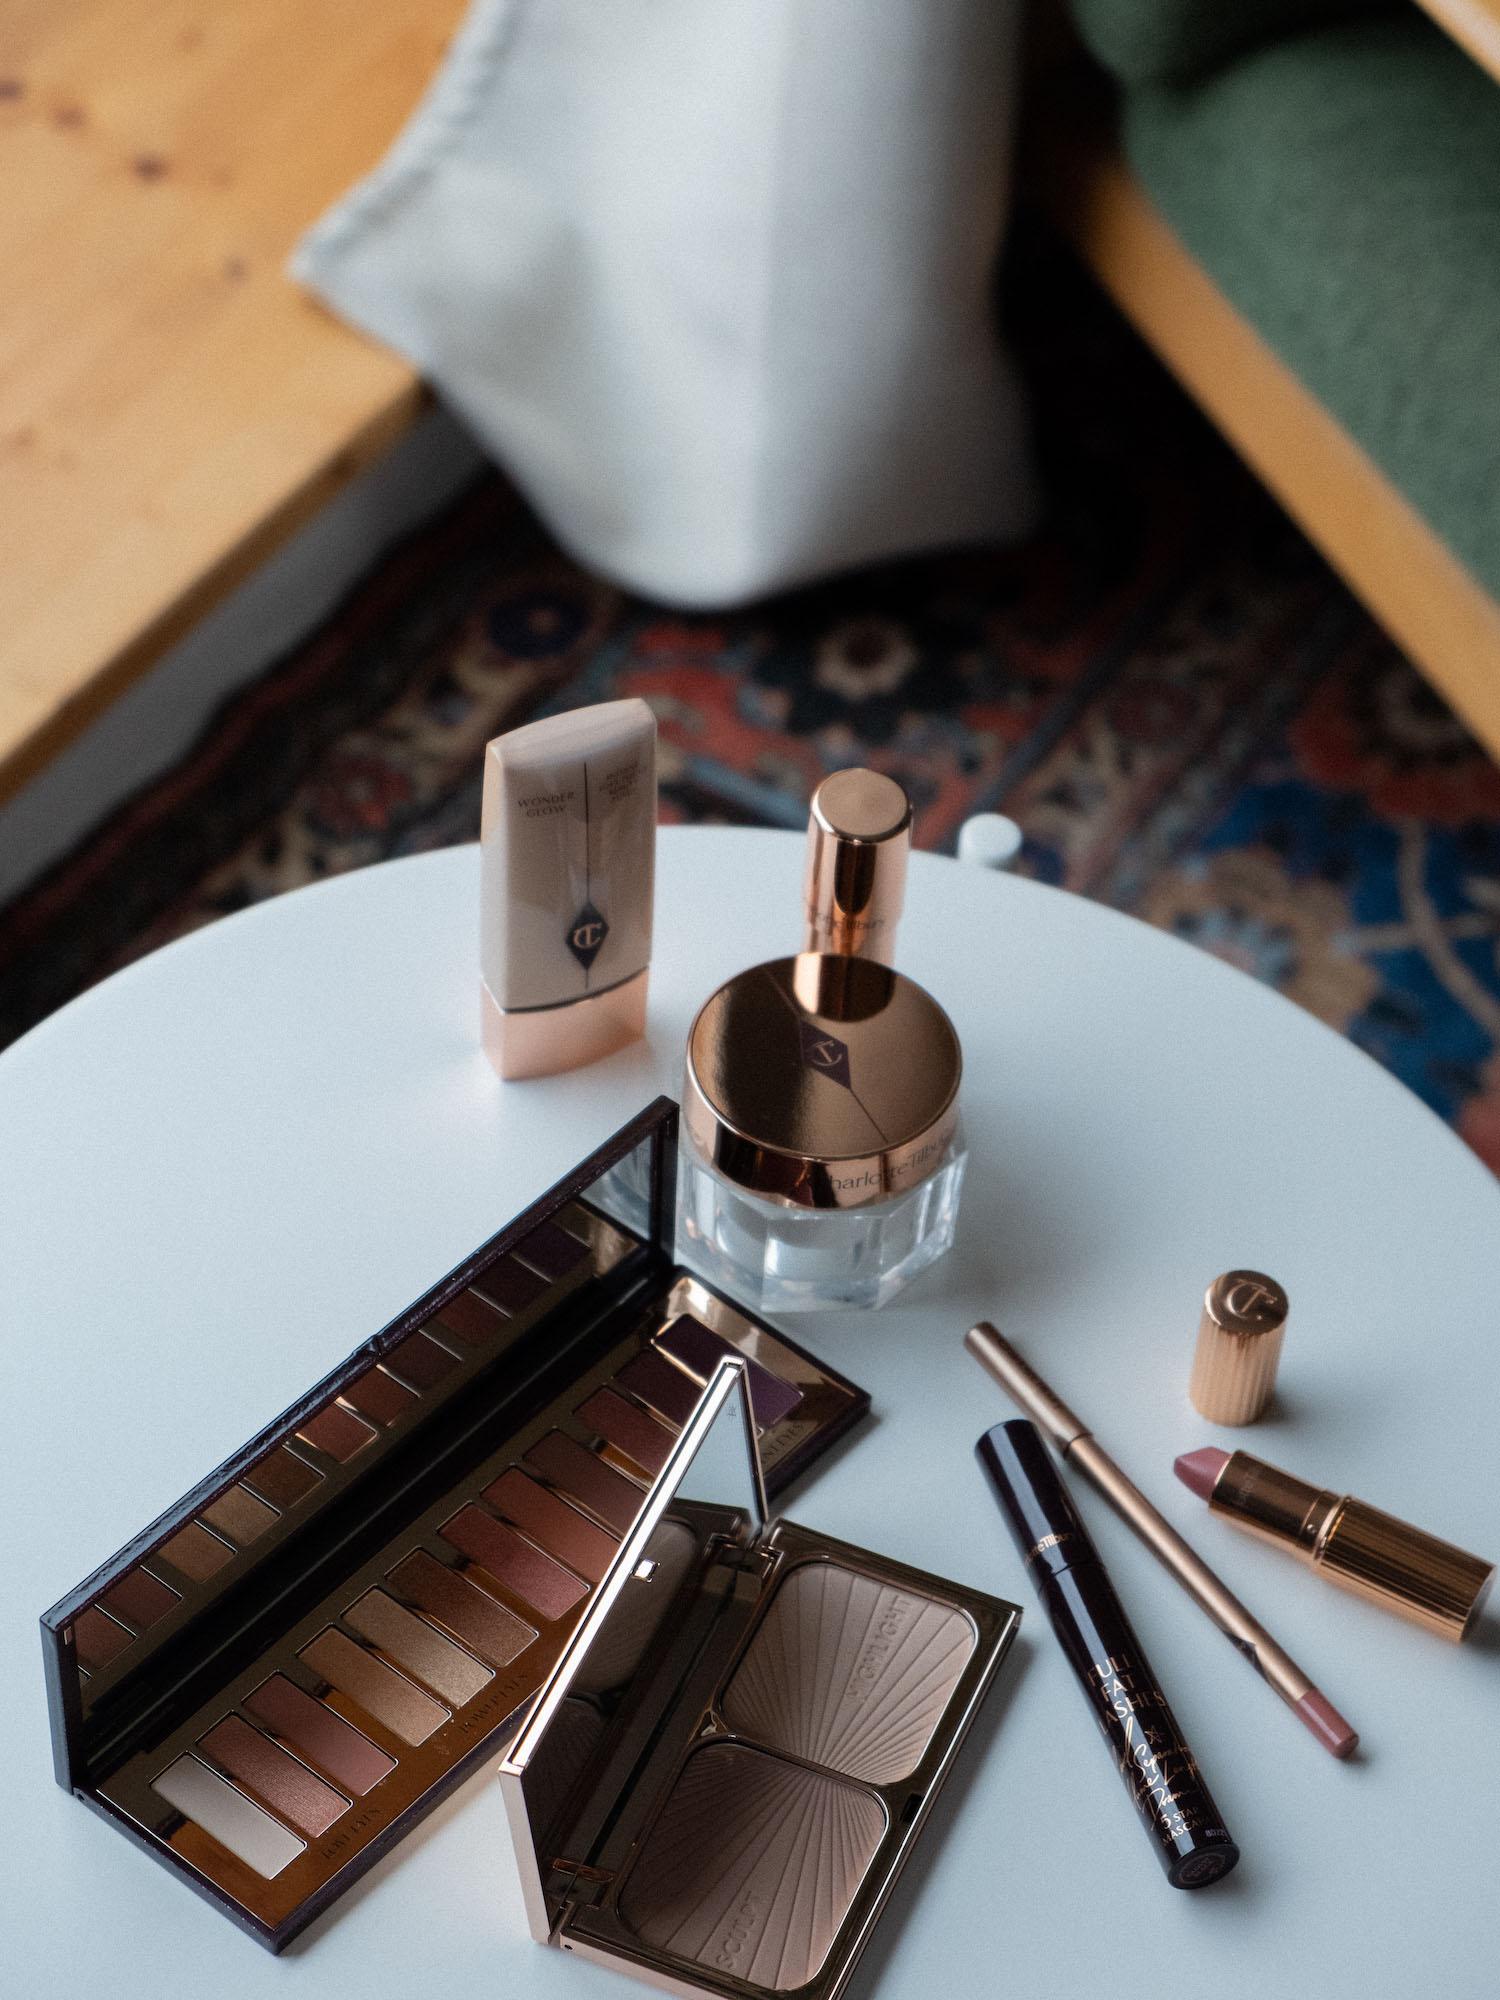 Bare Minds Beauty Adventskalender Charlotte Tilbury Bronze and Glow